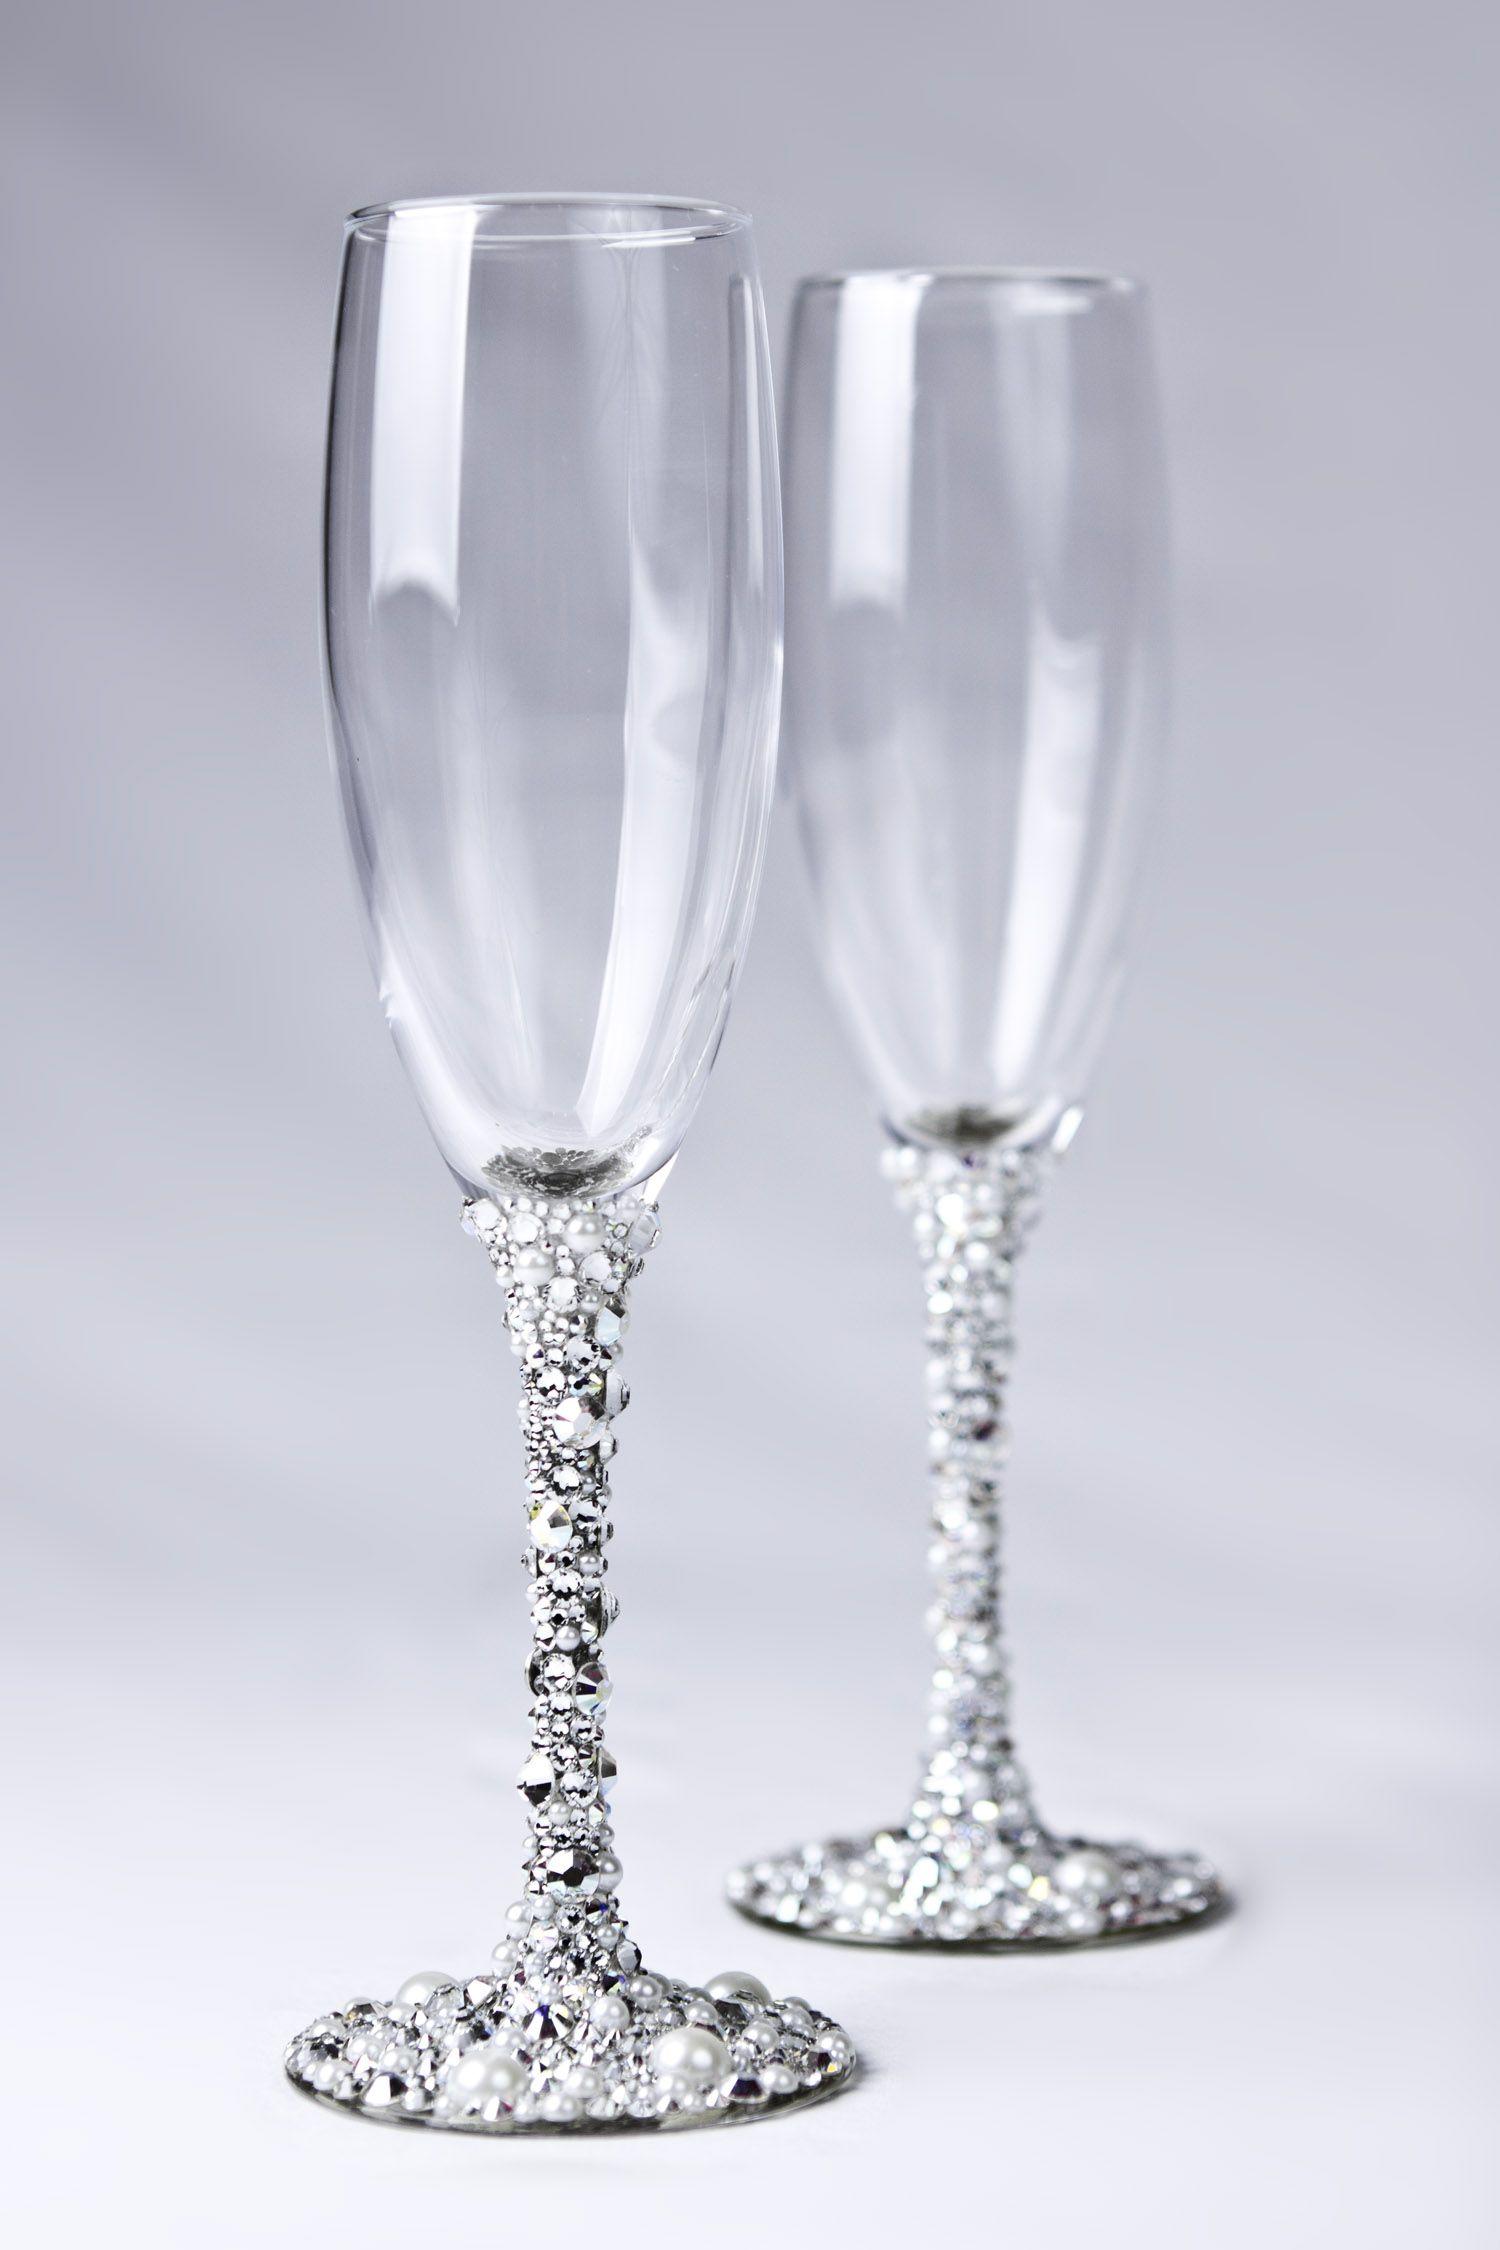 Swarovski crystal champagne glasses handmade i want to try this home goods pinterest - Swarovski stemware ...